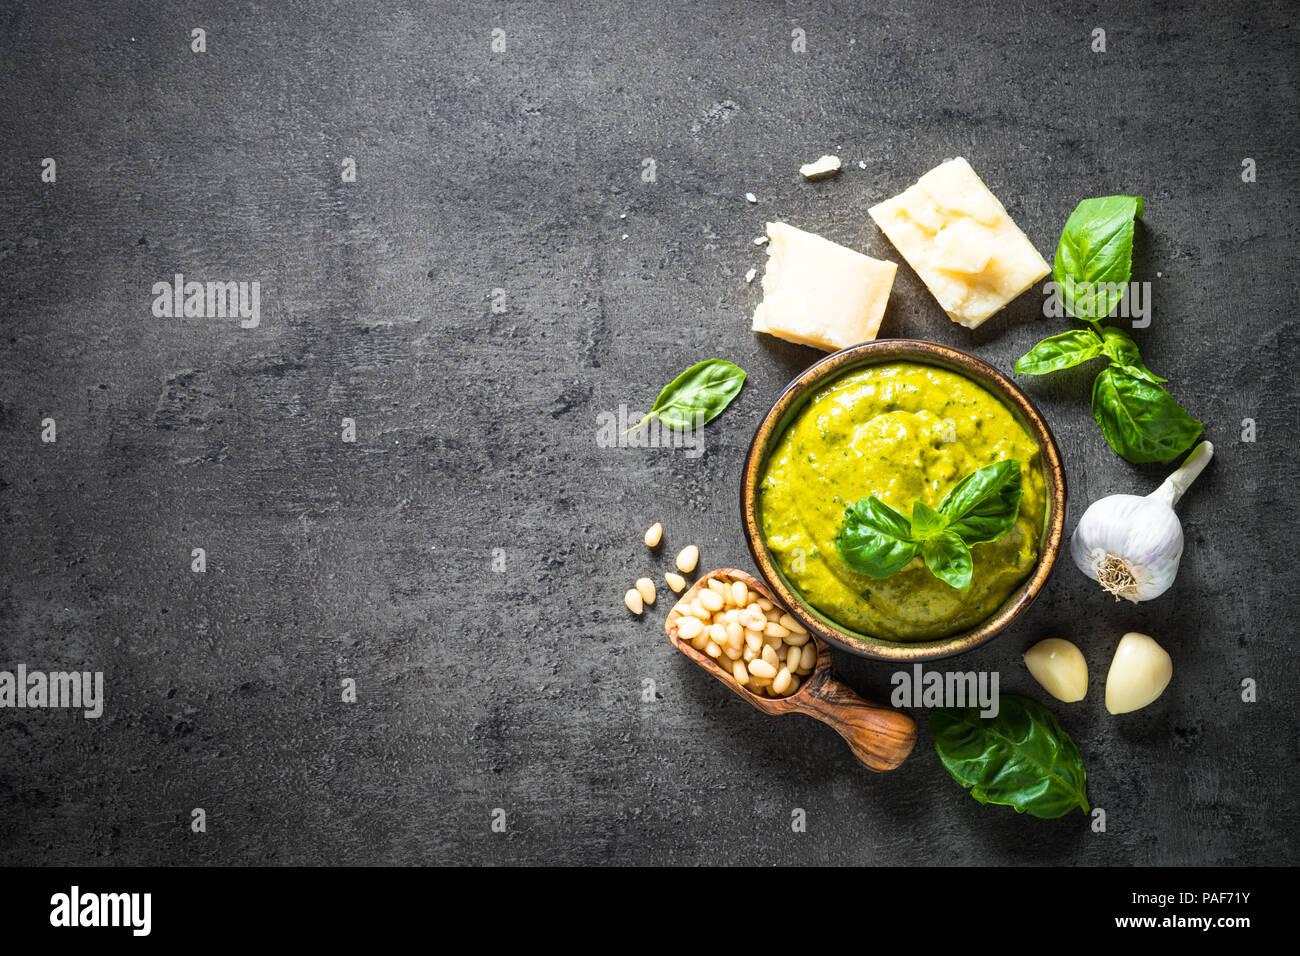 Pesto sauce with ingredients on dark stone table.  - Stock Image